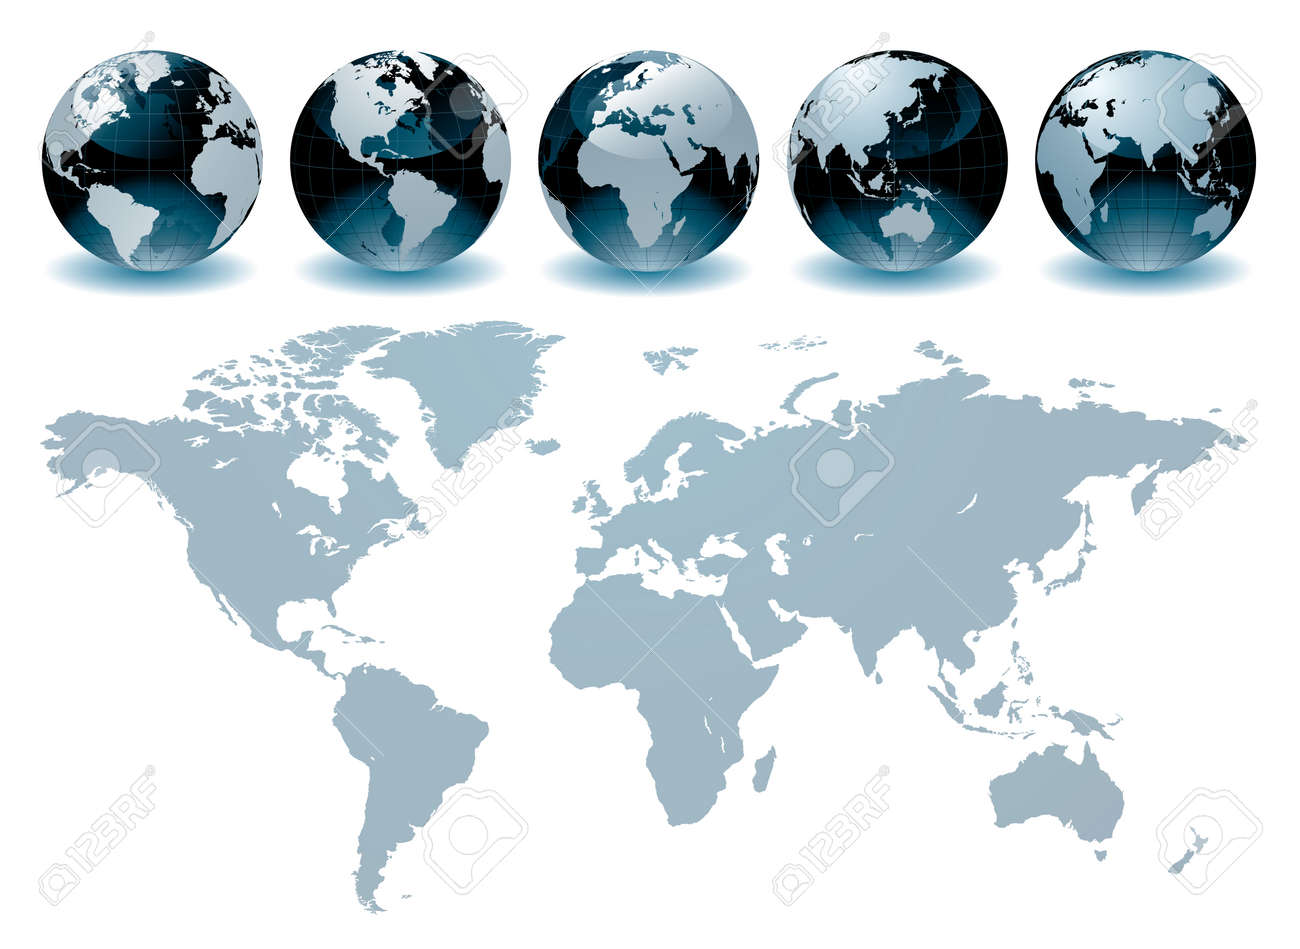 World Globe Maps Royalty Free Cliparts Vectors And Stock - World globe map